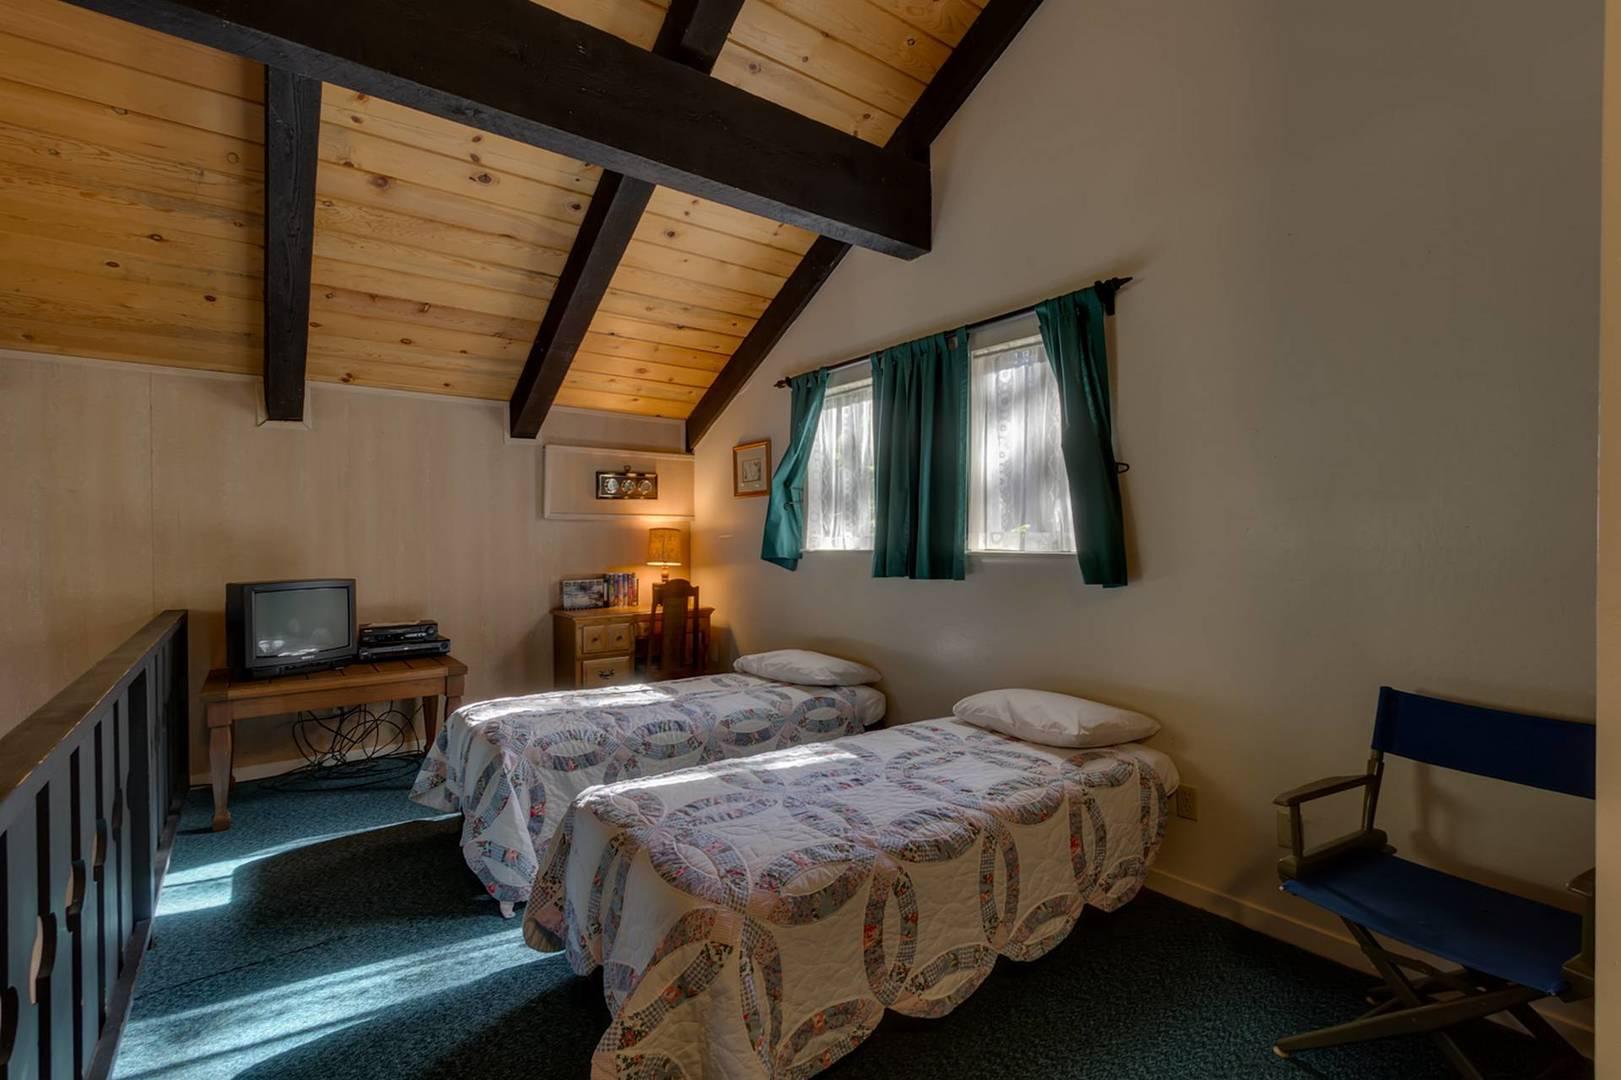 ivh1051 bedroom